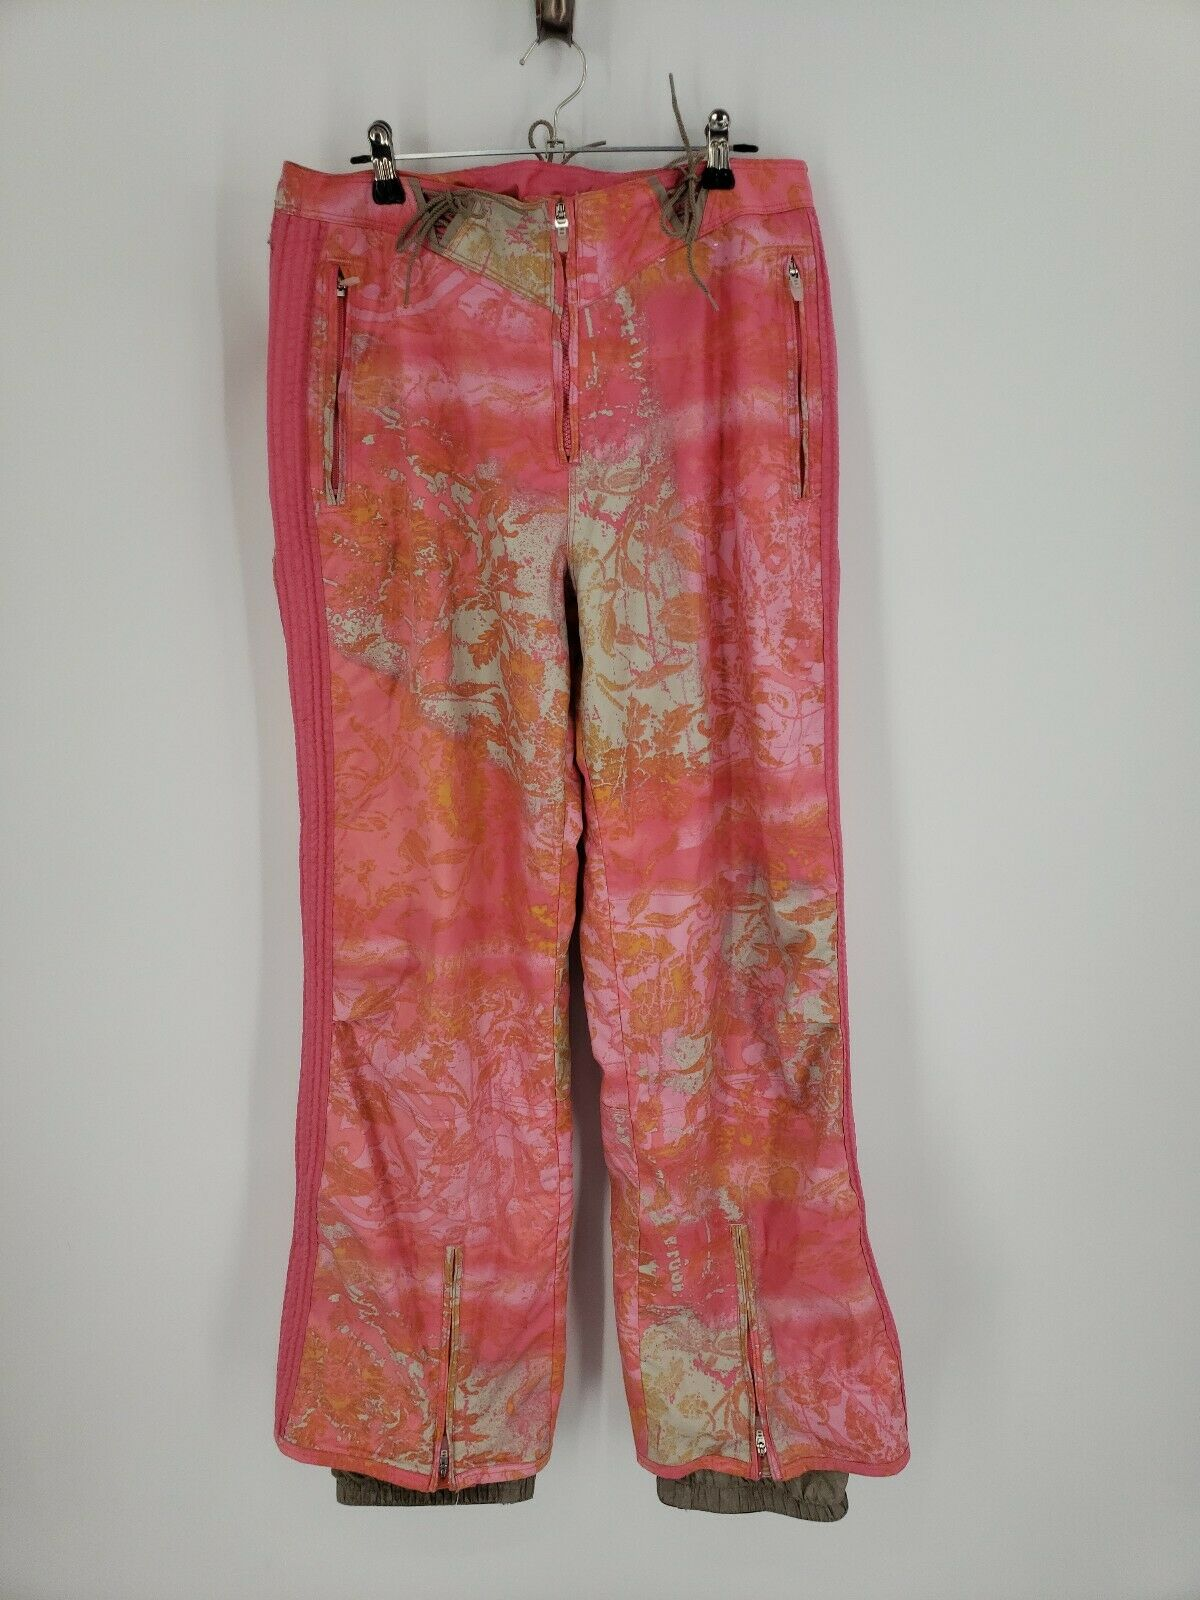 Obermeyer Dynasty Ski Pant Women's Size 8 Pink Print Floral Print Snow pants